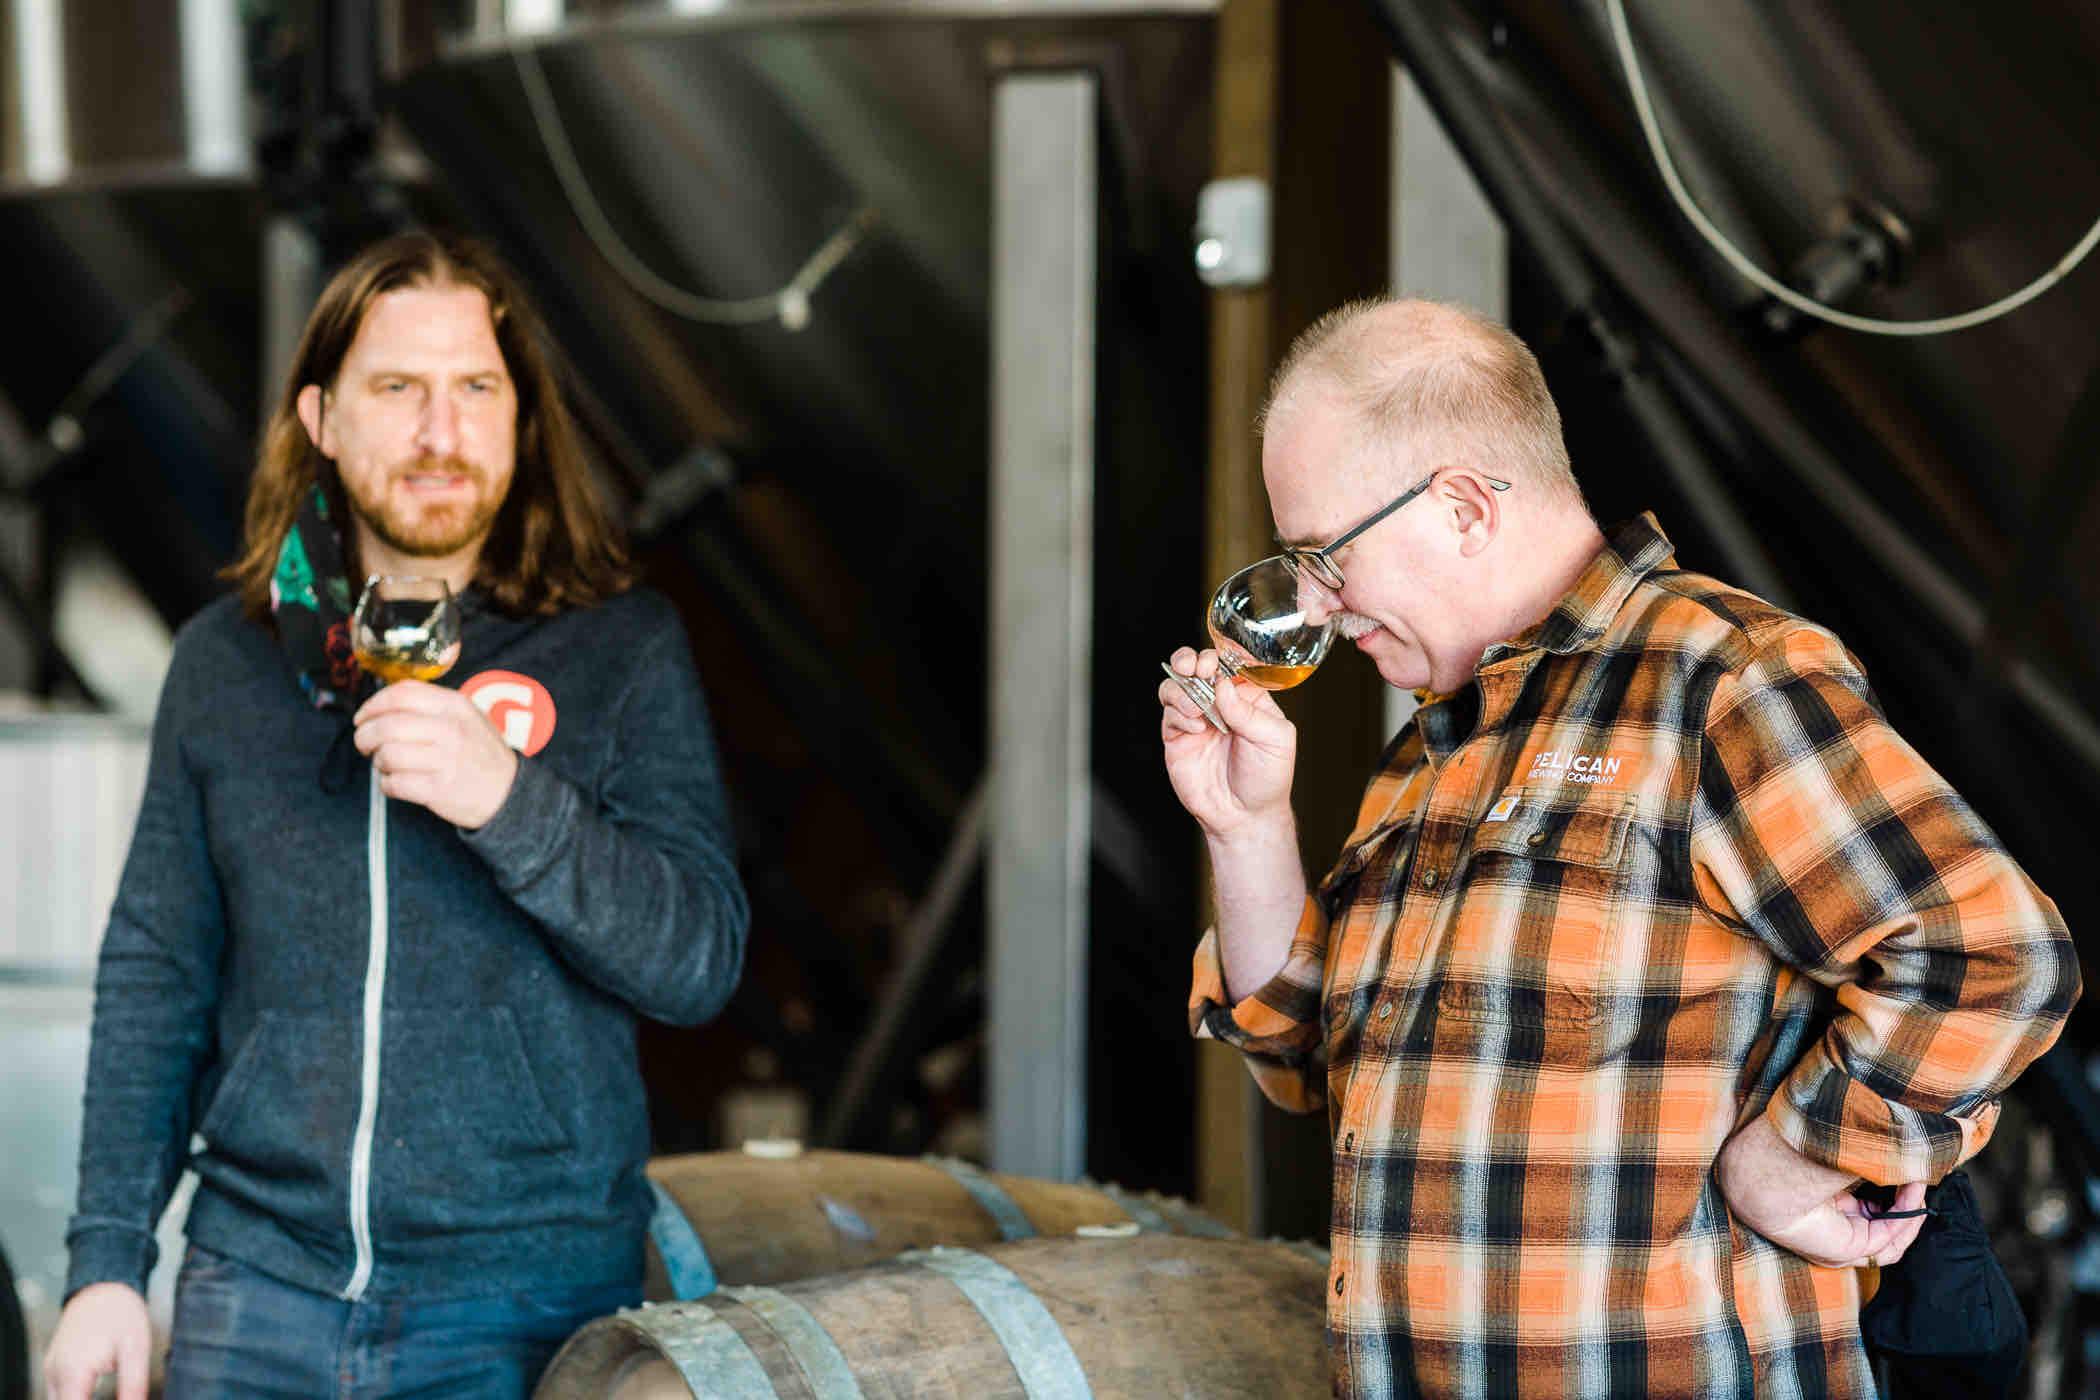 Ben Love and Darron Welch sampling Bird-Day Volume II Tangerine Golden Ale Aged in Mezcal Barrels. (image courtesy of Pelican Brewing)